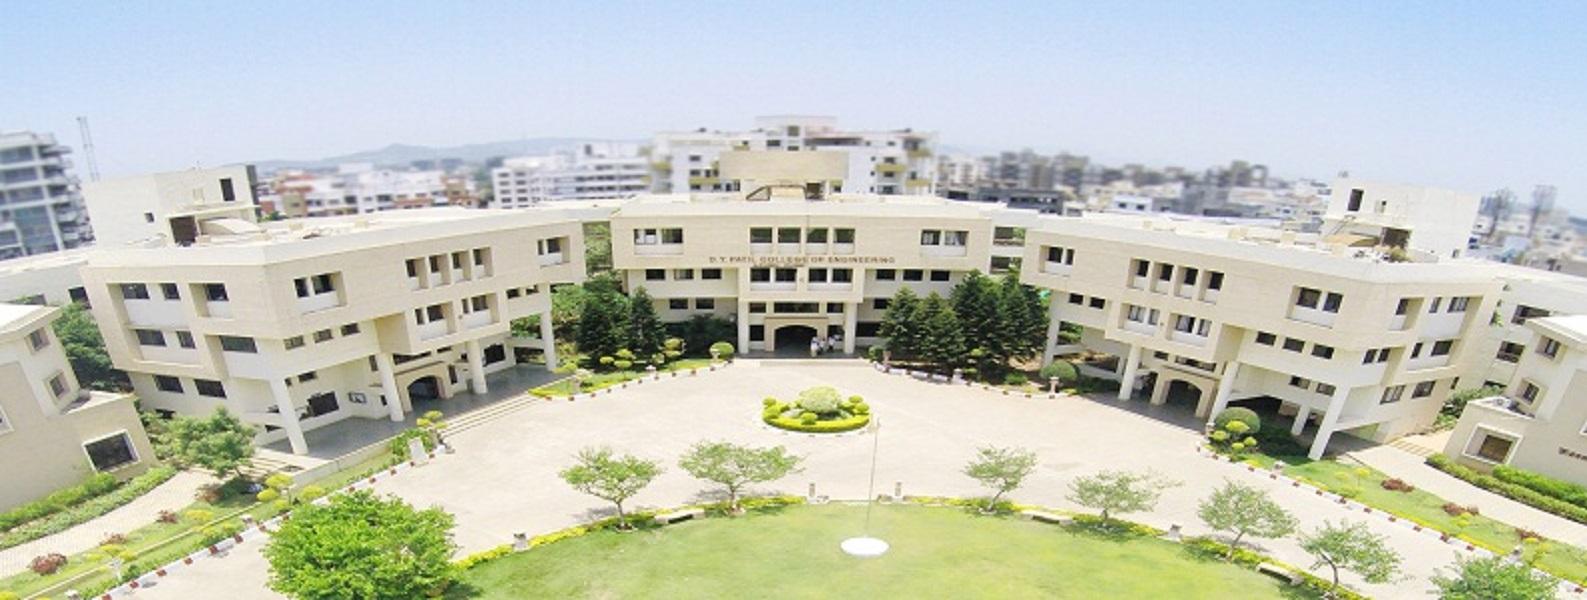 Direct Admission in D. Y. Patil College Pune through Management Quota